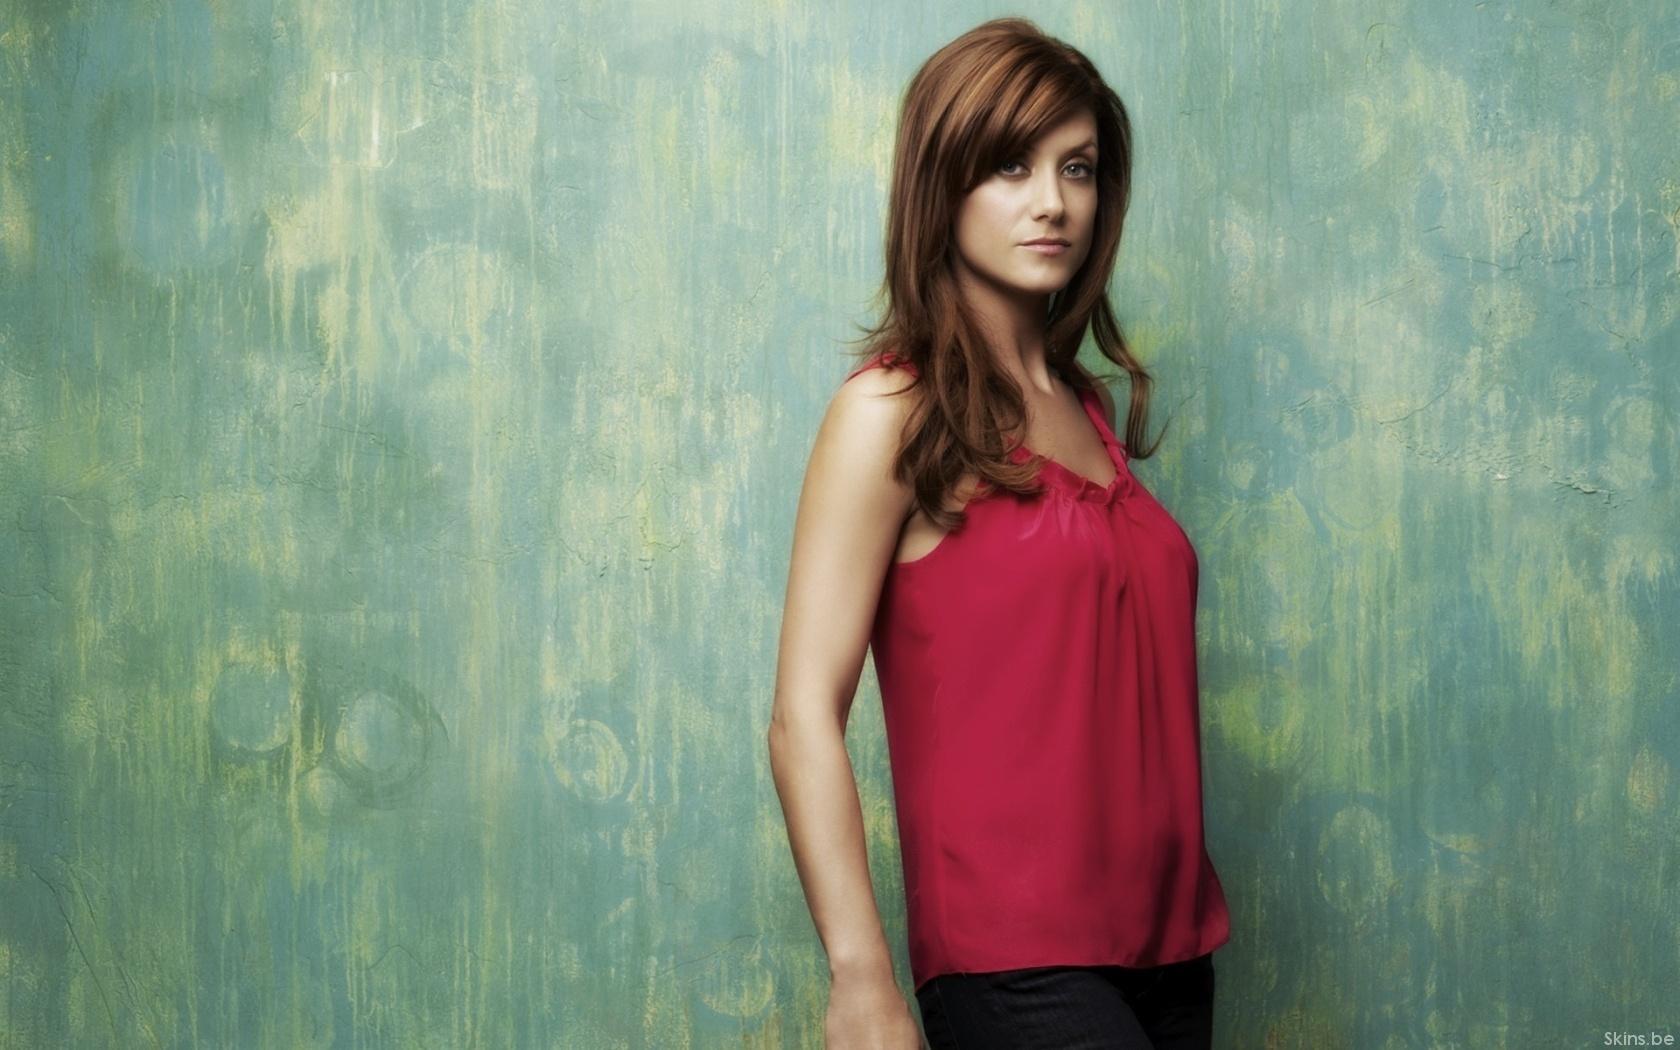 Kate Walsh wall - Actresses Wallpaper (9480328) - Fanpop